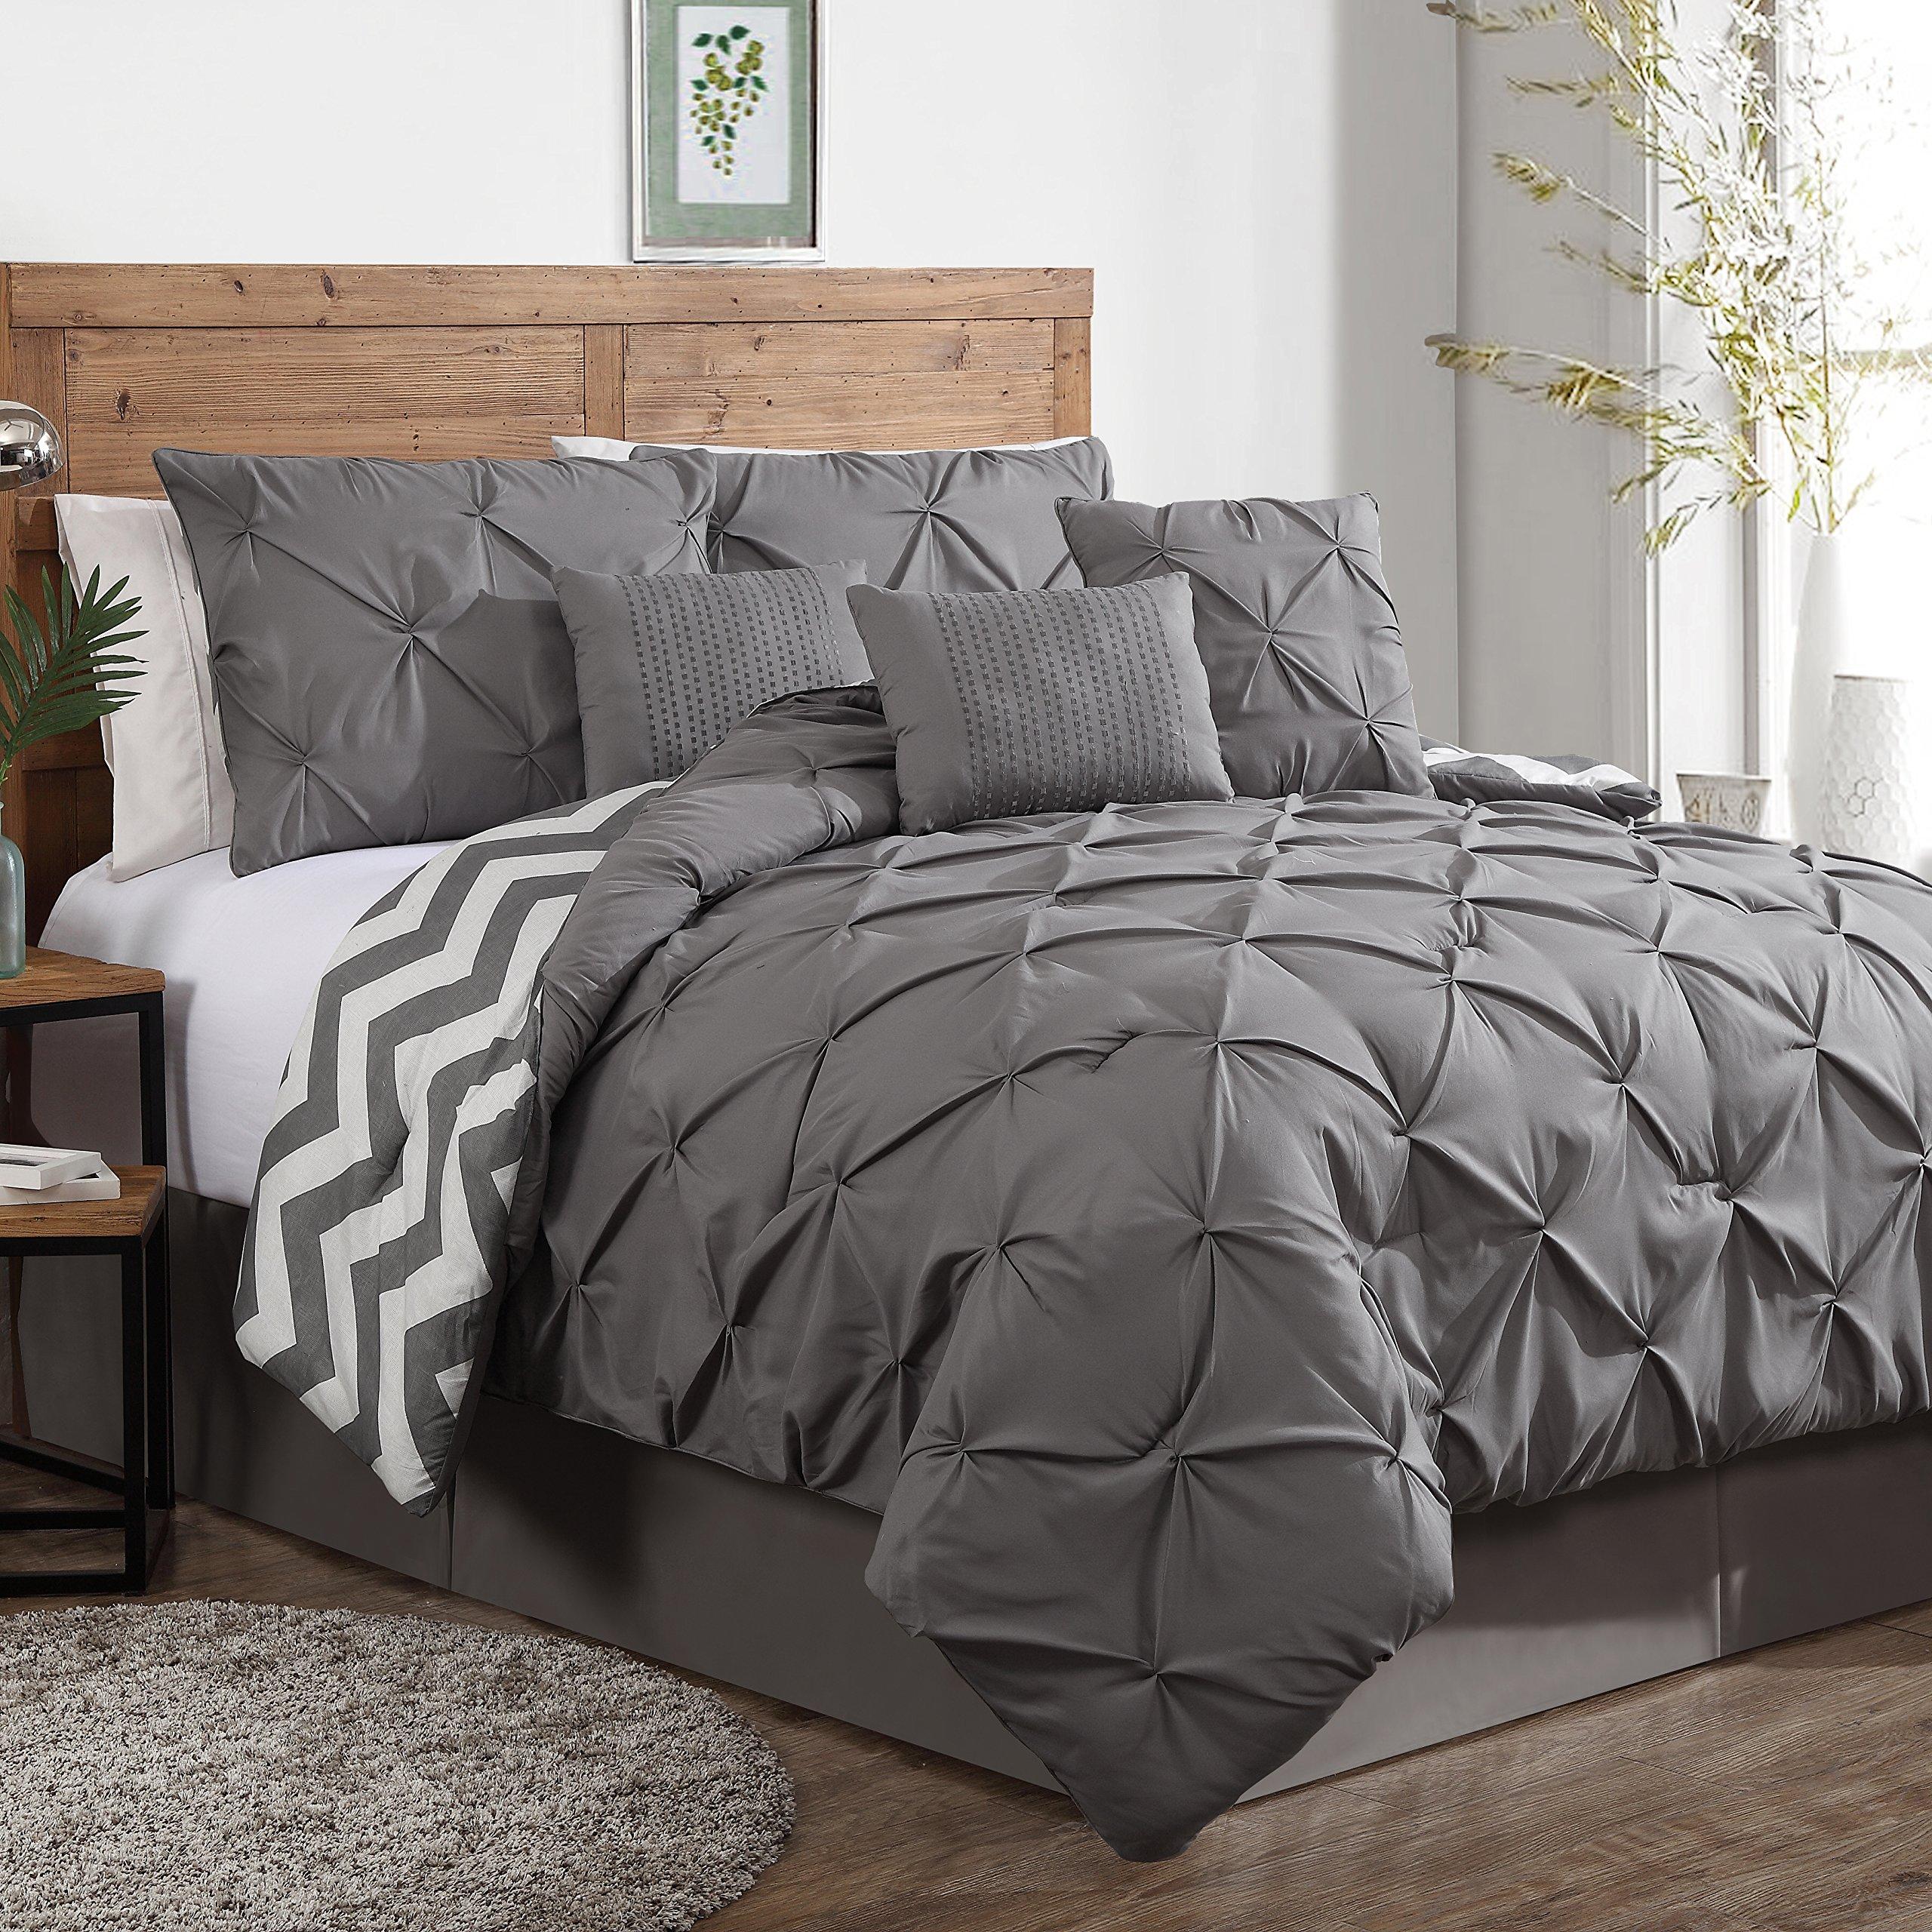 pleat piece rochelle gray coffee itm pinched set comforter ebay